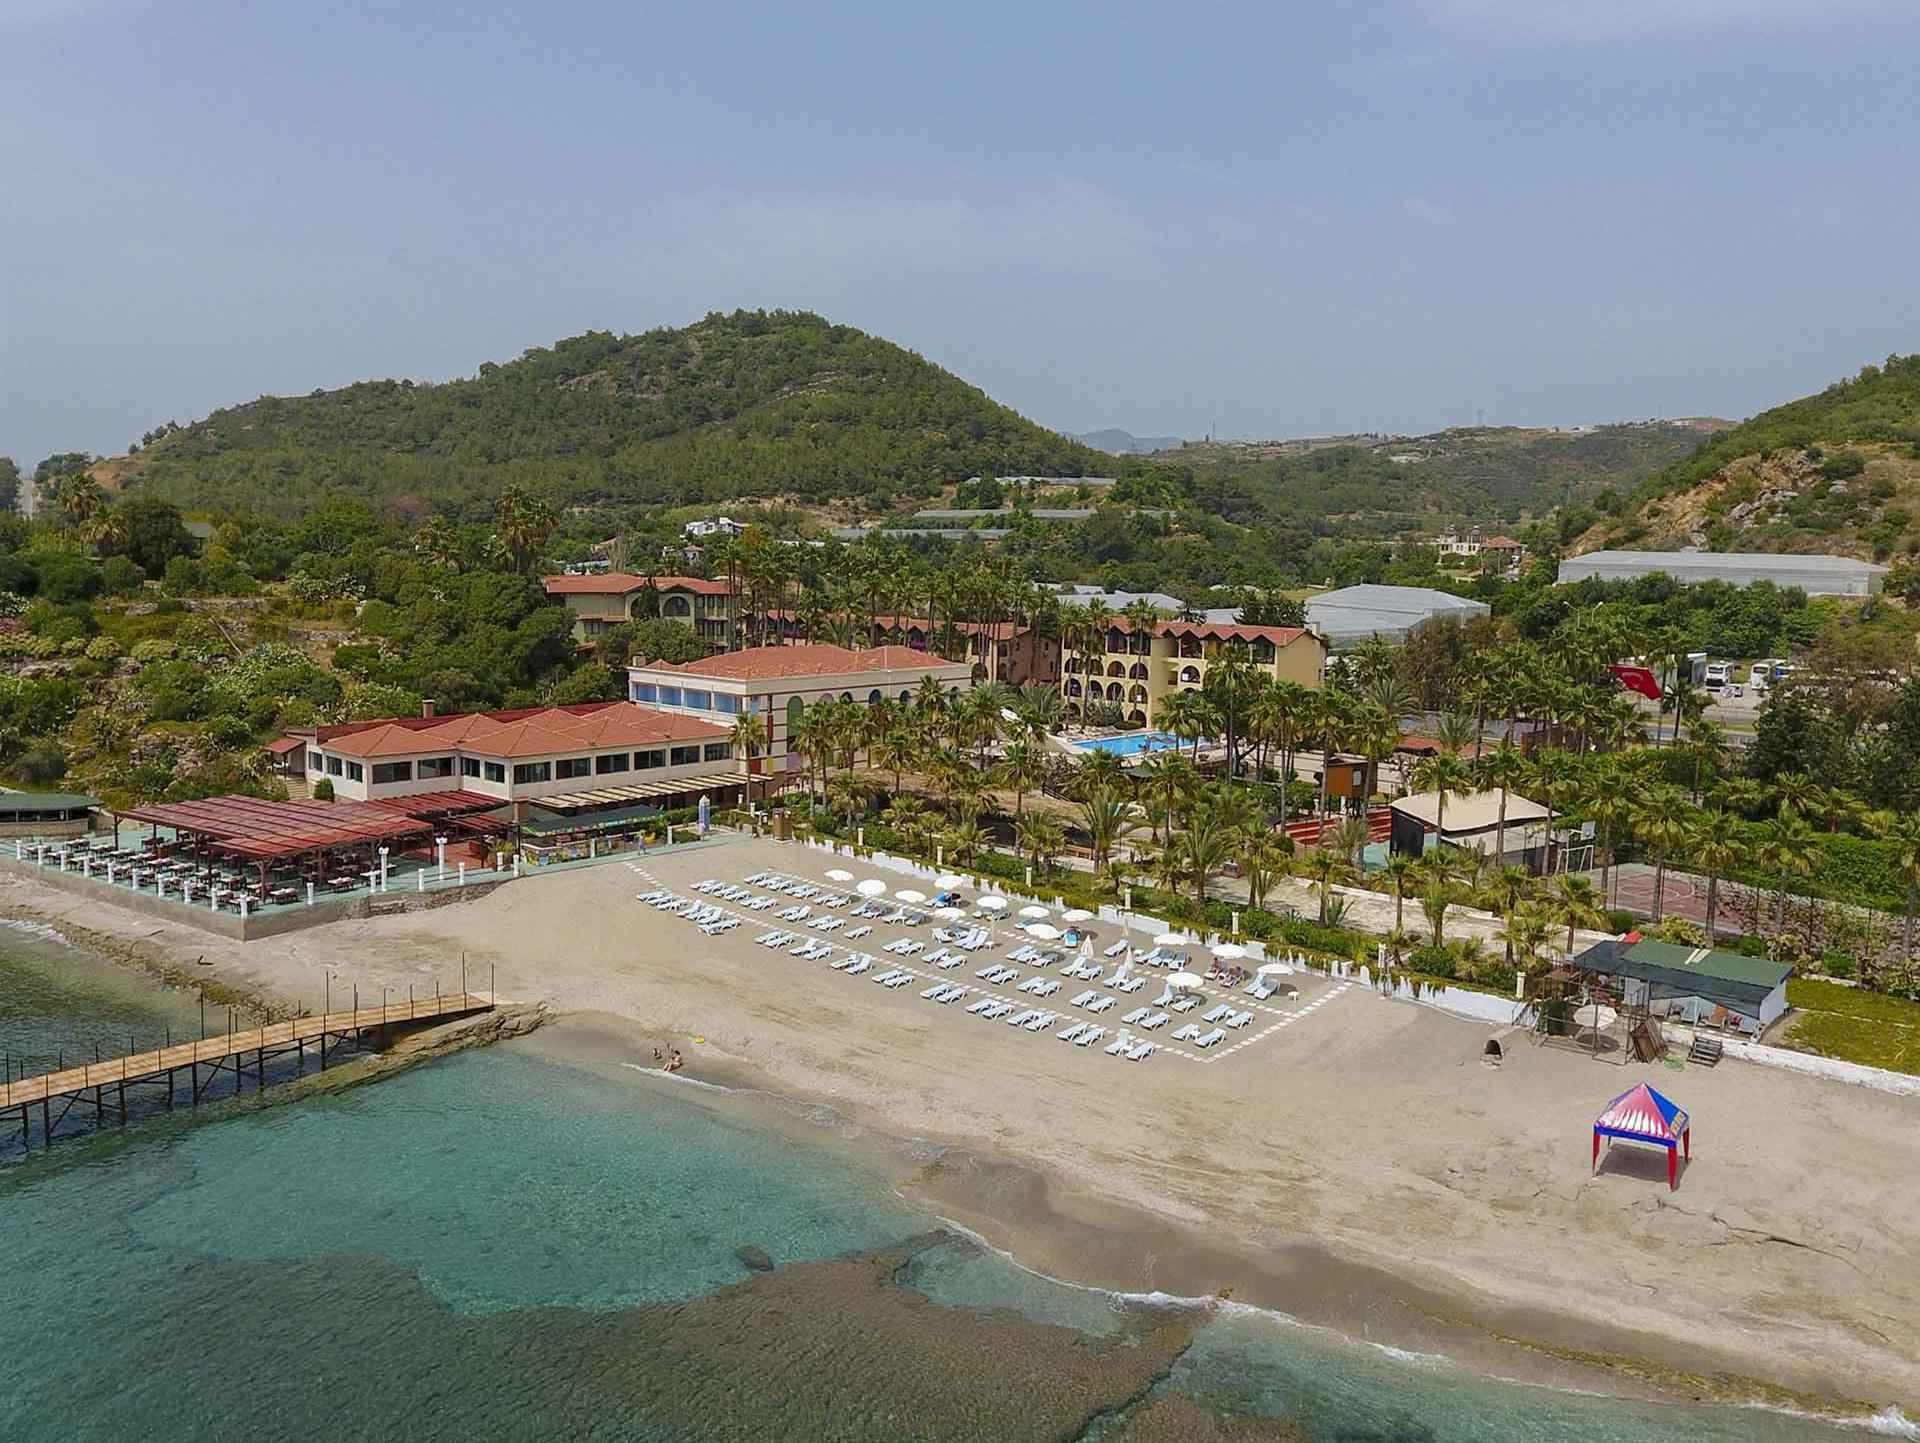 Larissa Green Hill Hotel 5 , Alanya: yorumlar ve fotoğraflar 24